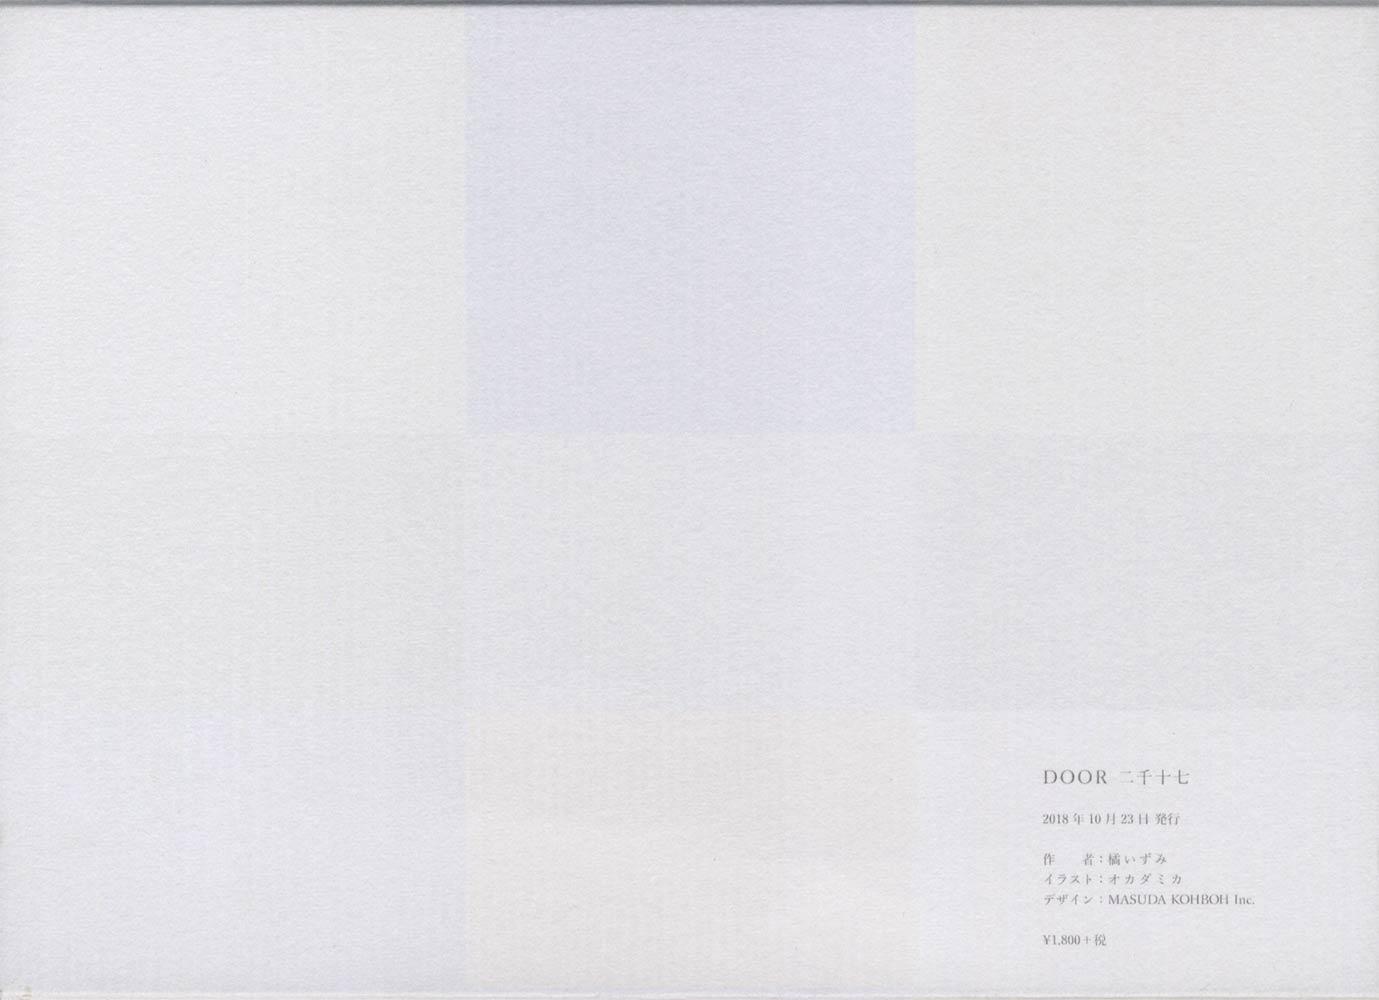 DOOR 二千十七 橘いずみ作品集[image2]